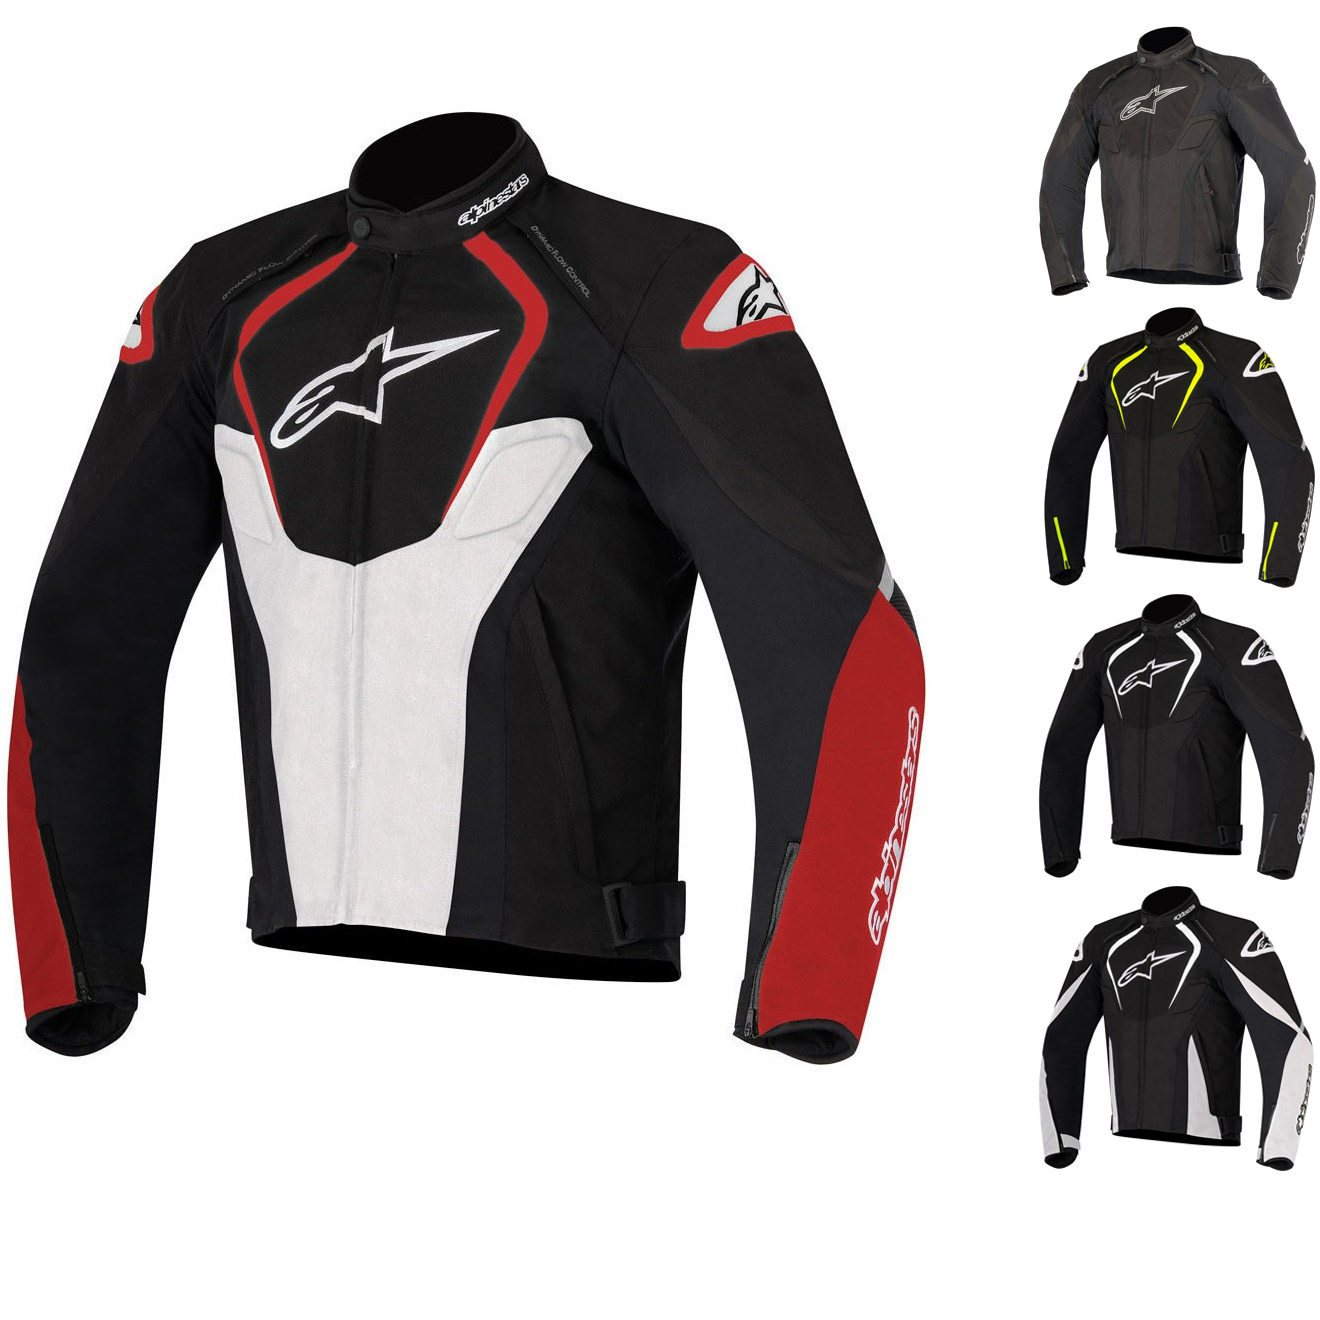 Alpinestar Motorcycle Gloves >> Alpinestars T-Jaws WP v2 Motorcycle Jacket Motorbike Thermal Waterproof Armour | eBay